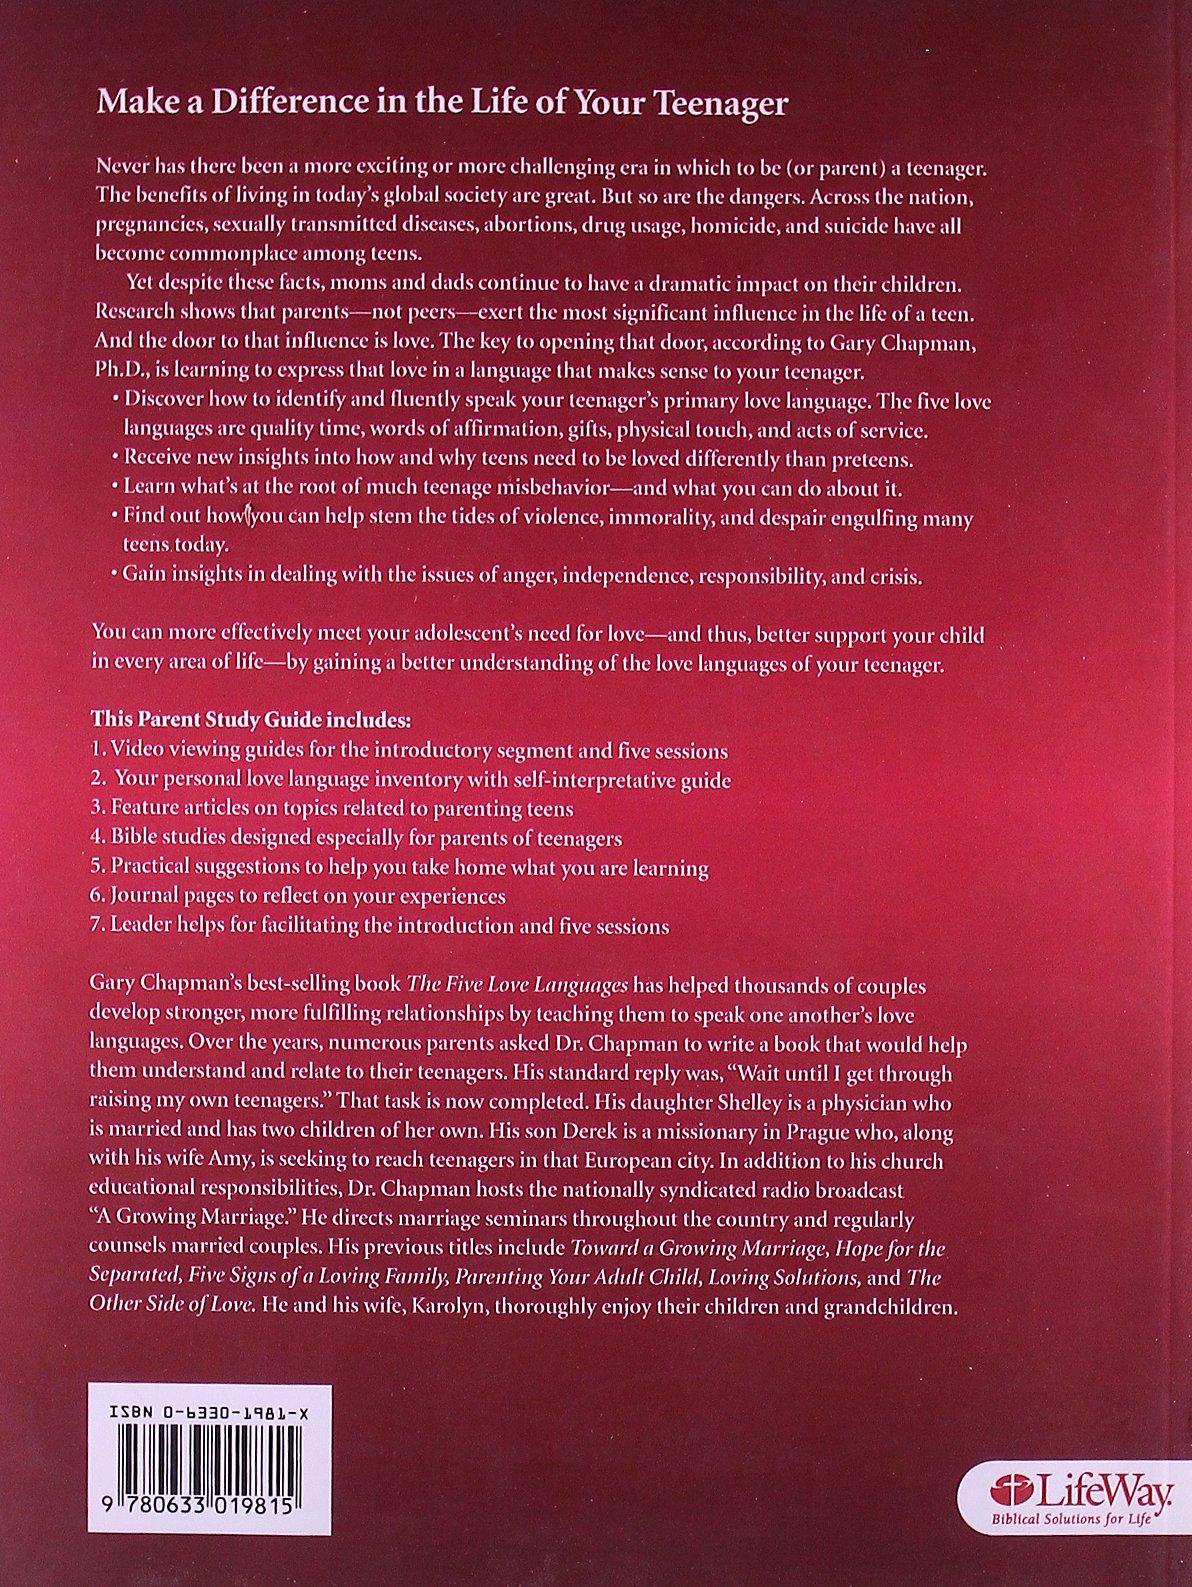 The Five Love Languages Ofagers Parent Study Guide Gary Chapman 9780633019815 Amazon Com Books